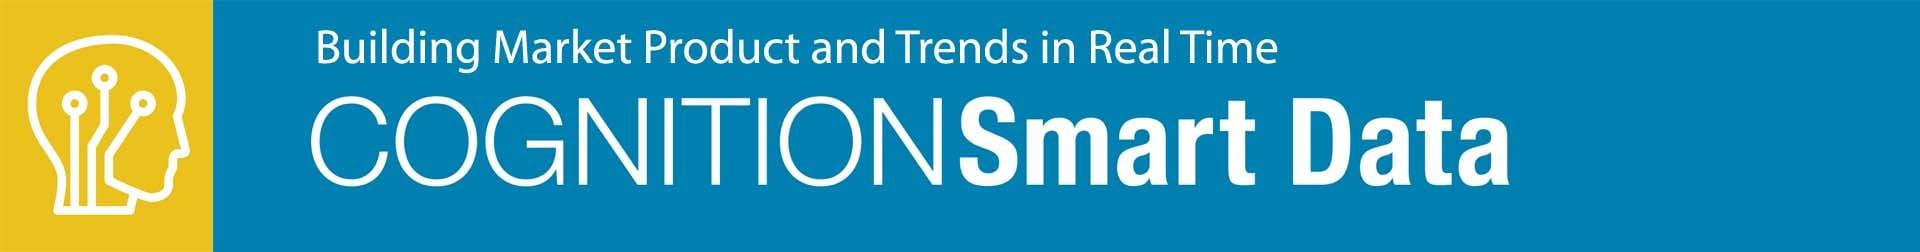 Cognition Smart Data header new 3